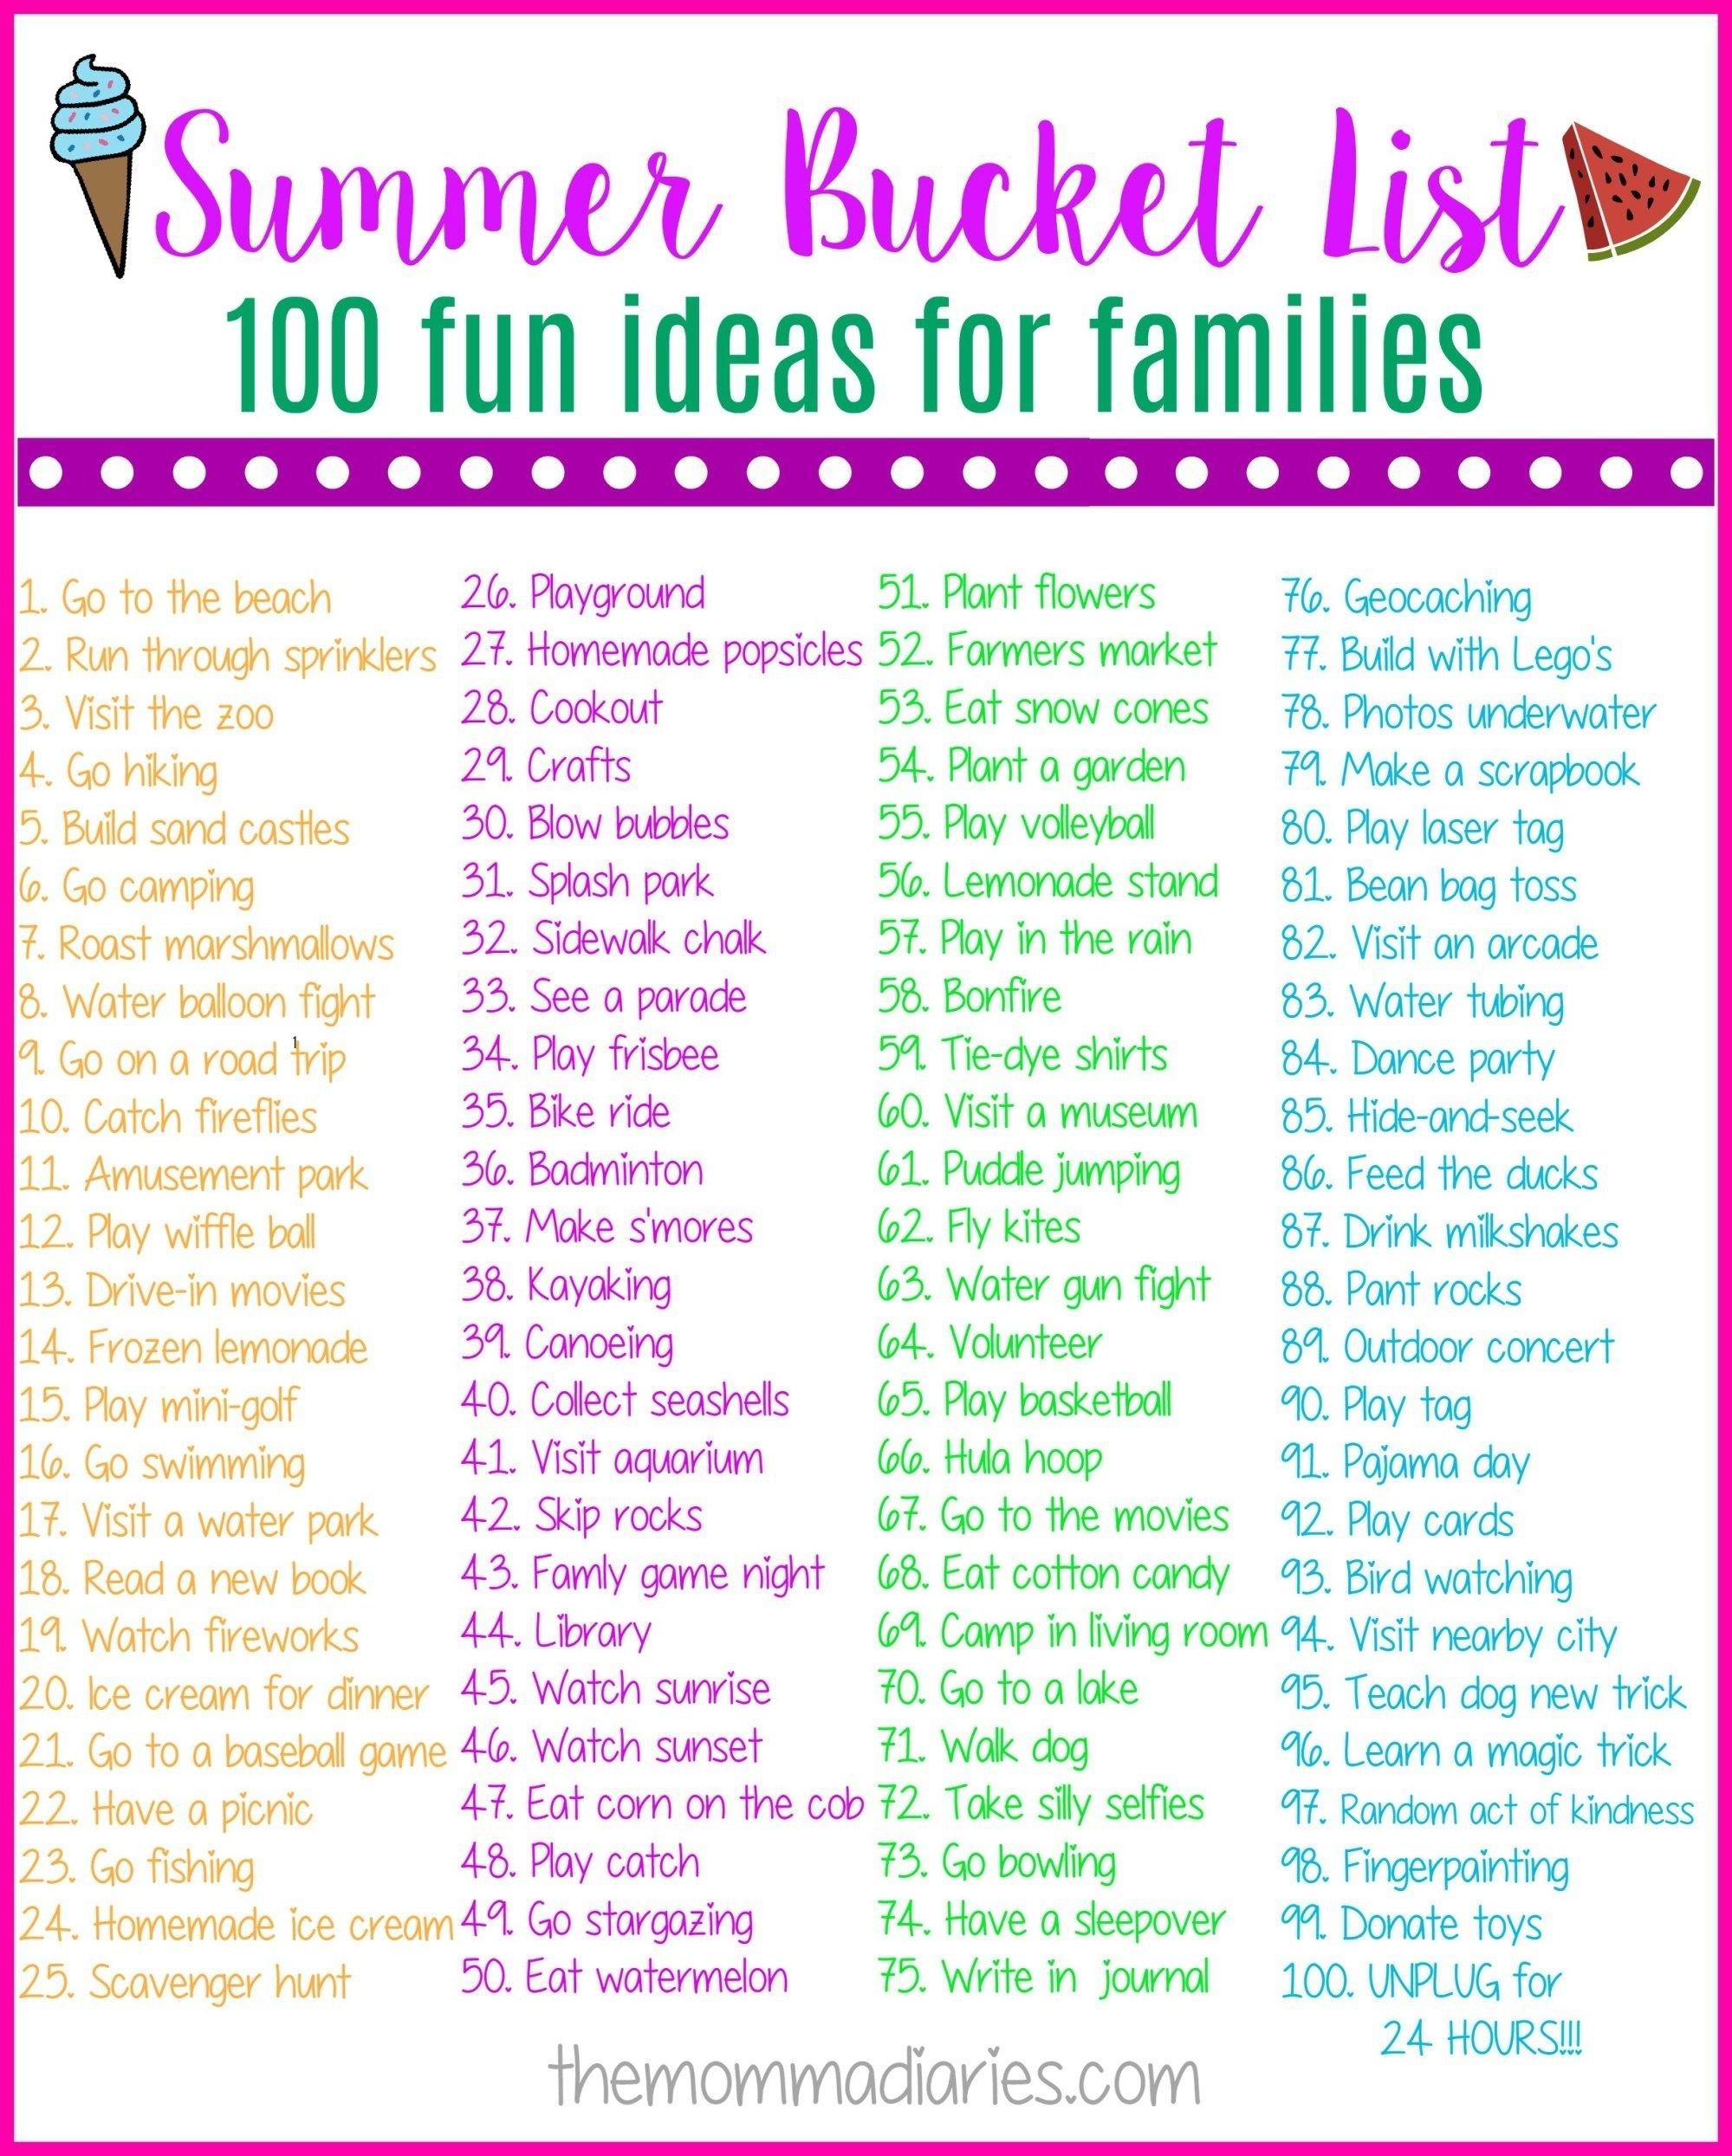 10 Attractive Fun Summer Bucket List Ideas summer bucket list 100 fun ideas for families activites enfants 2020